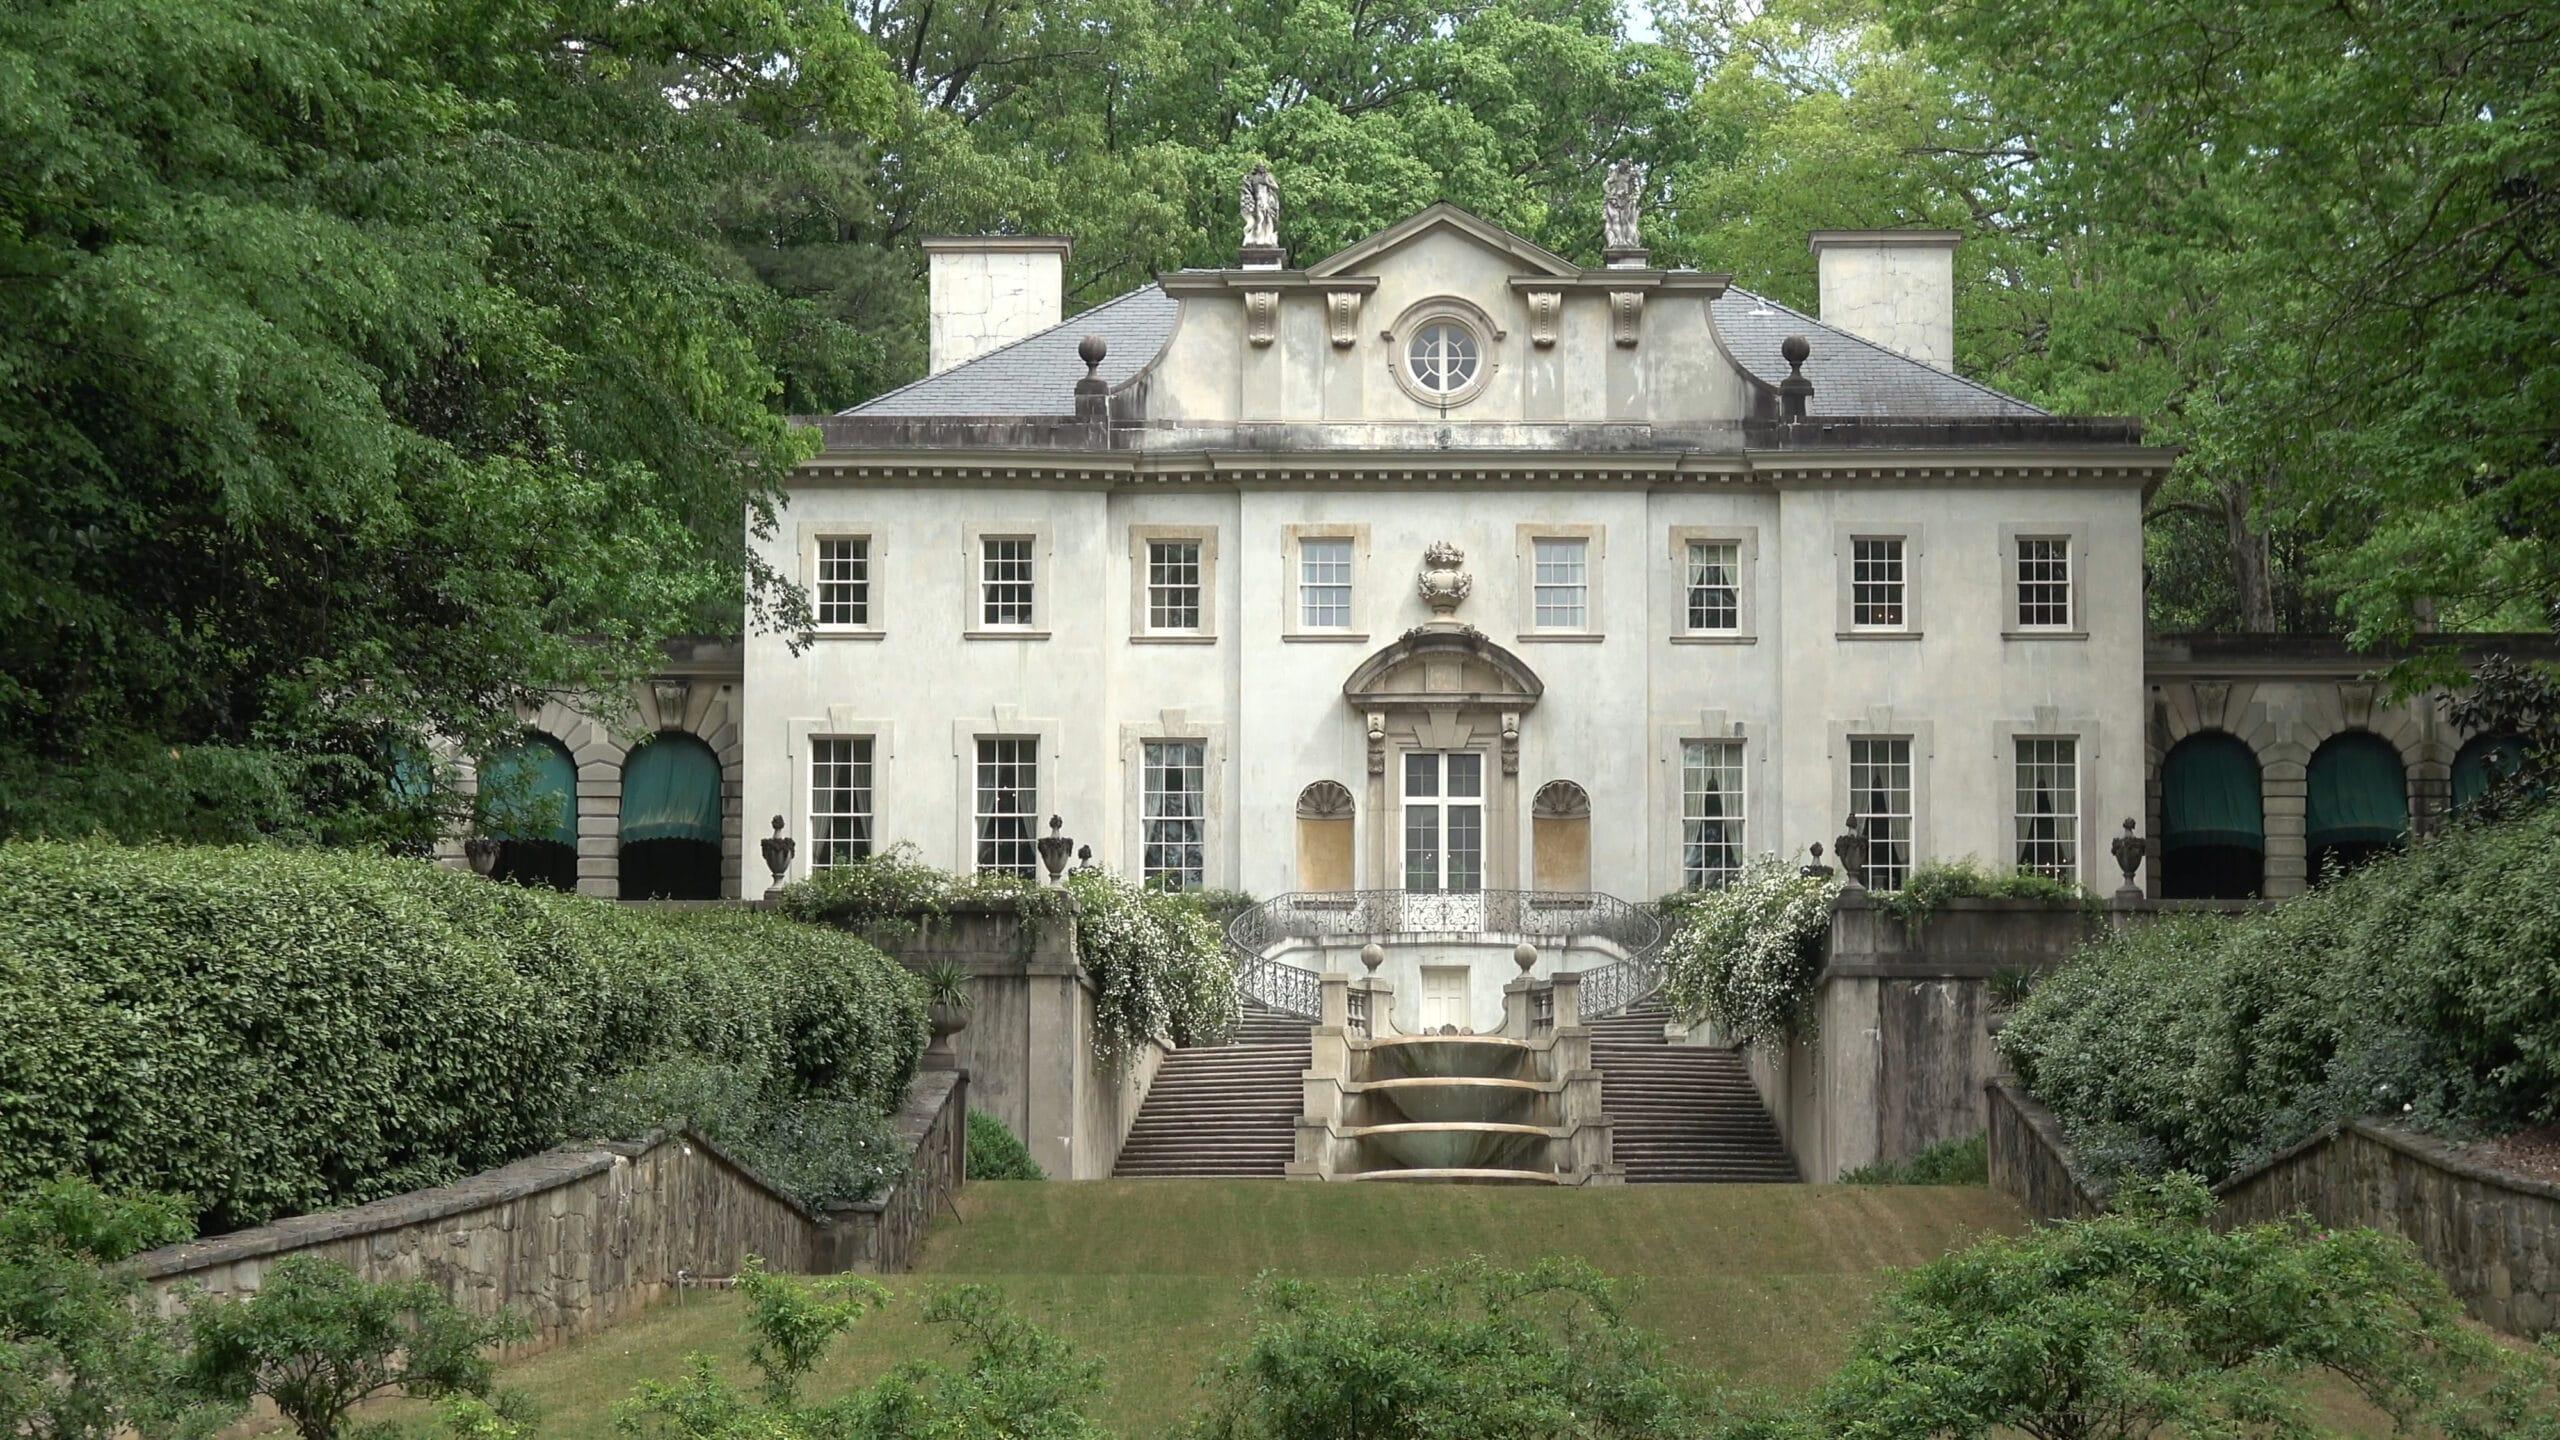 Famous Swan House in Atlanta - part of Atlanta History center - ATLANTA, GEORGIA - APRIL 22, 2016